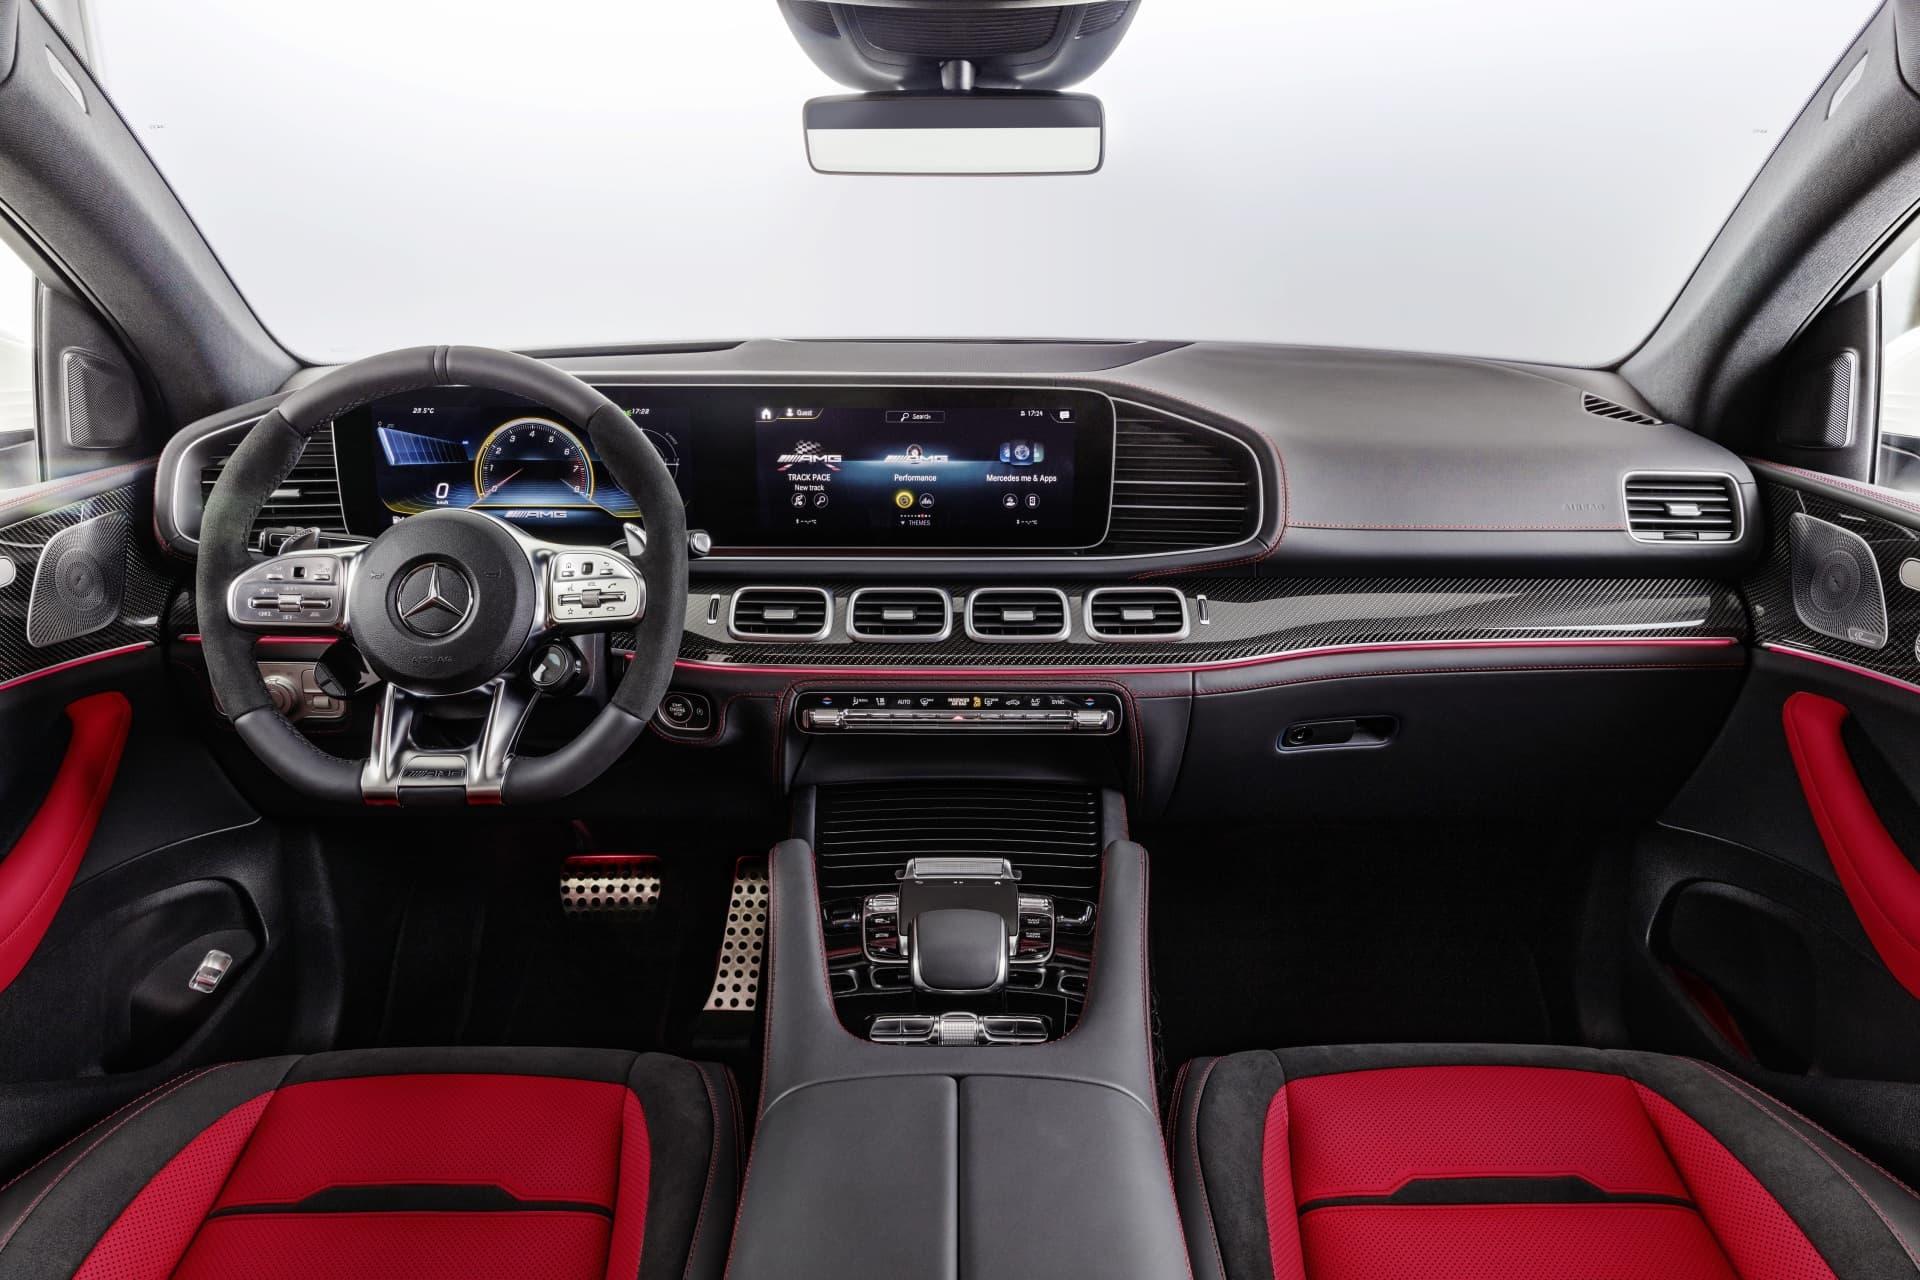 Mercedes Amg Gle 53 4matic+ Coupé, 2019 Mercedes Amg Gle 53 4matic+ Coupé, 2019